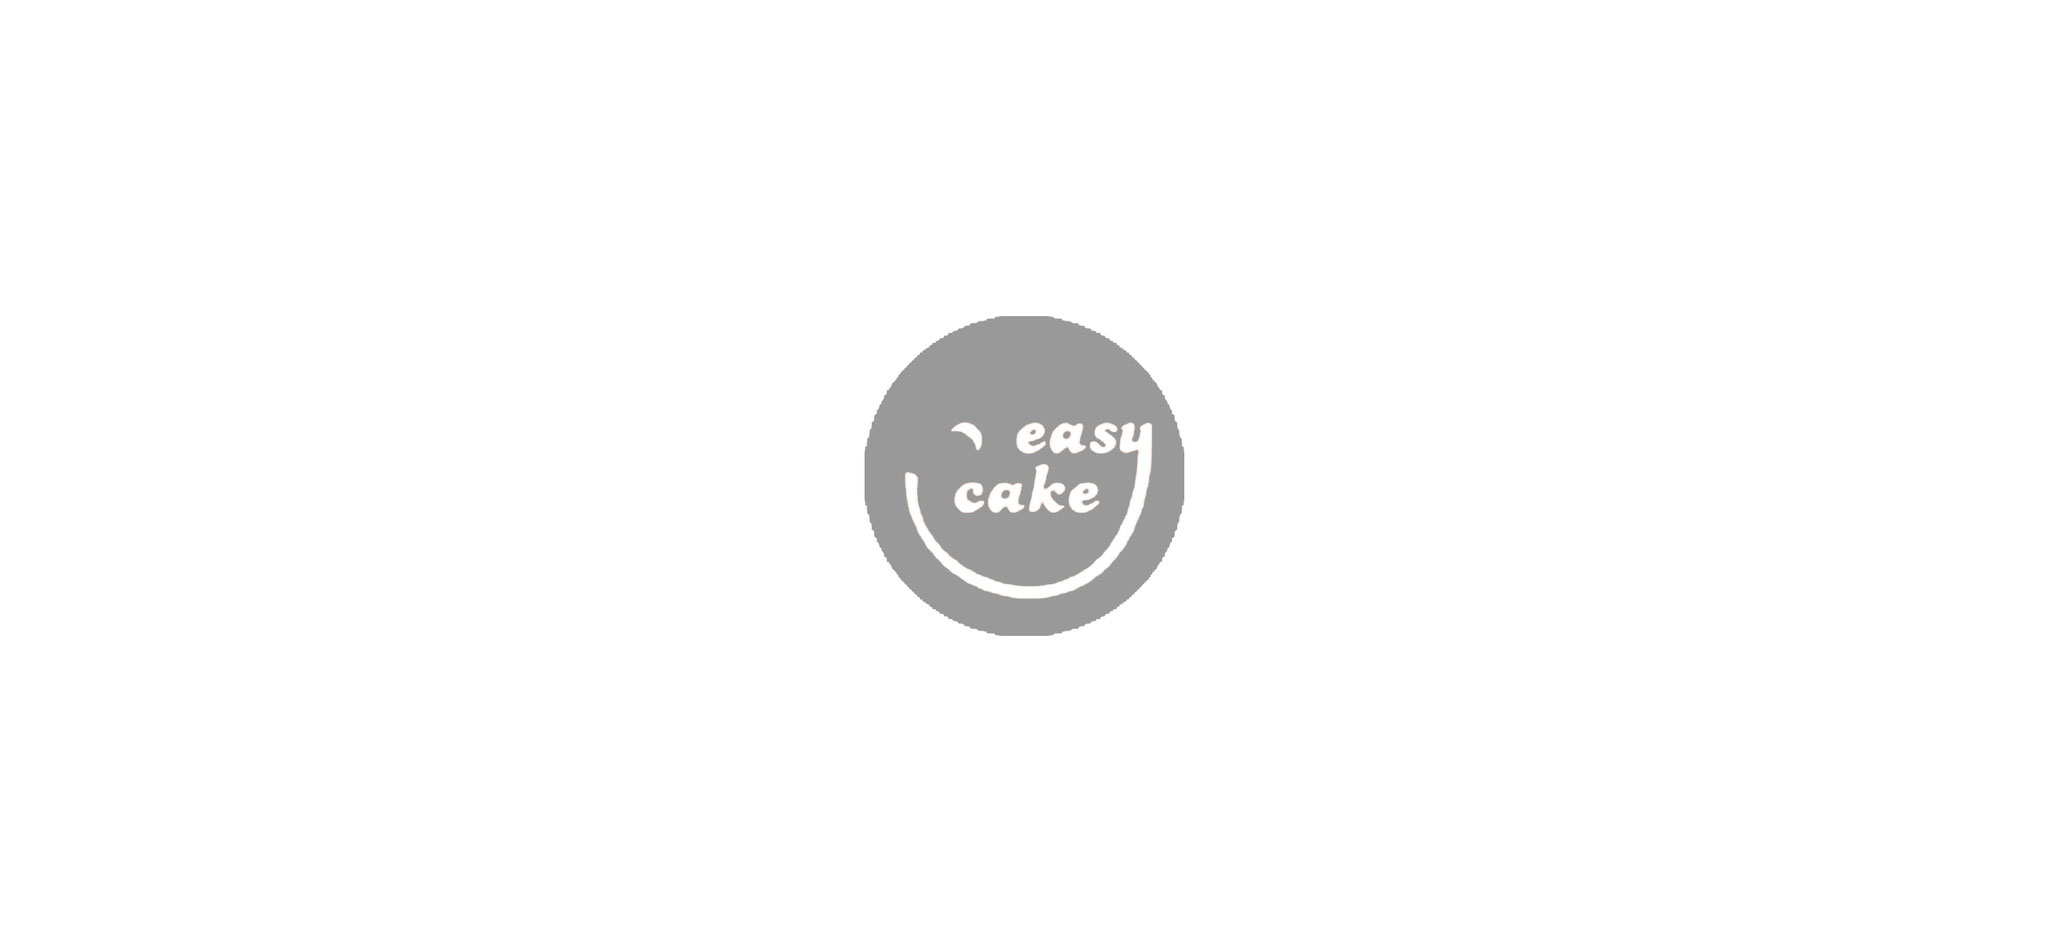 FLECHTORFER MÜHLE | logo easy cake – infragrau, gute gestaltung